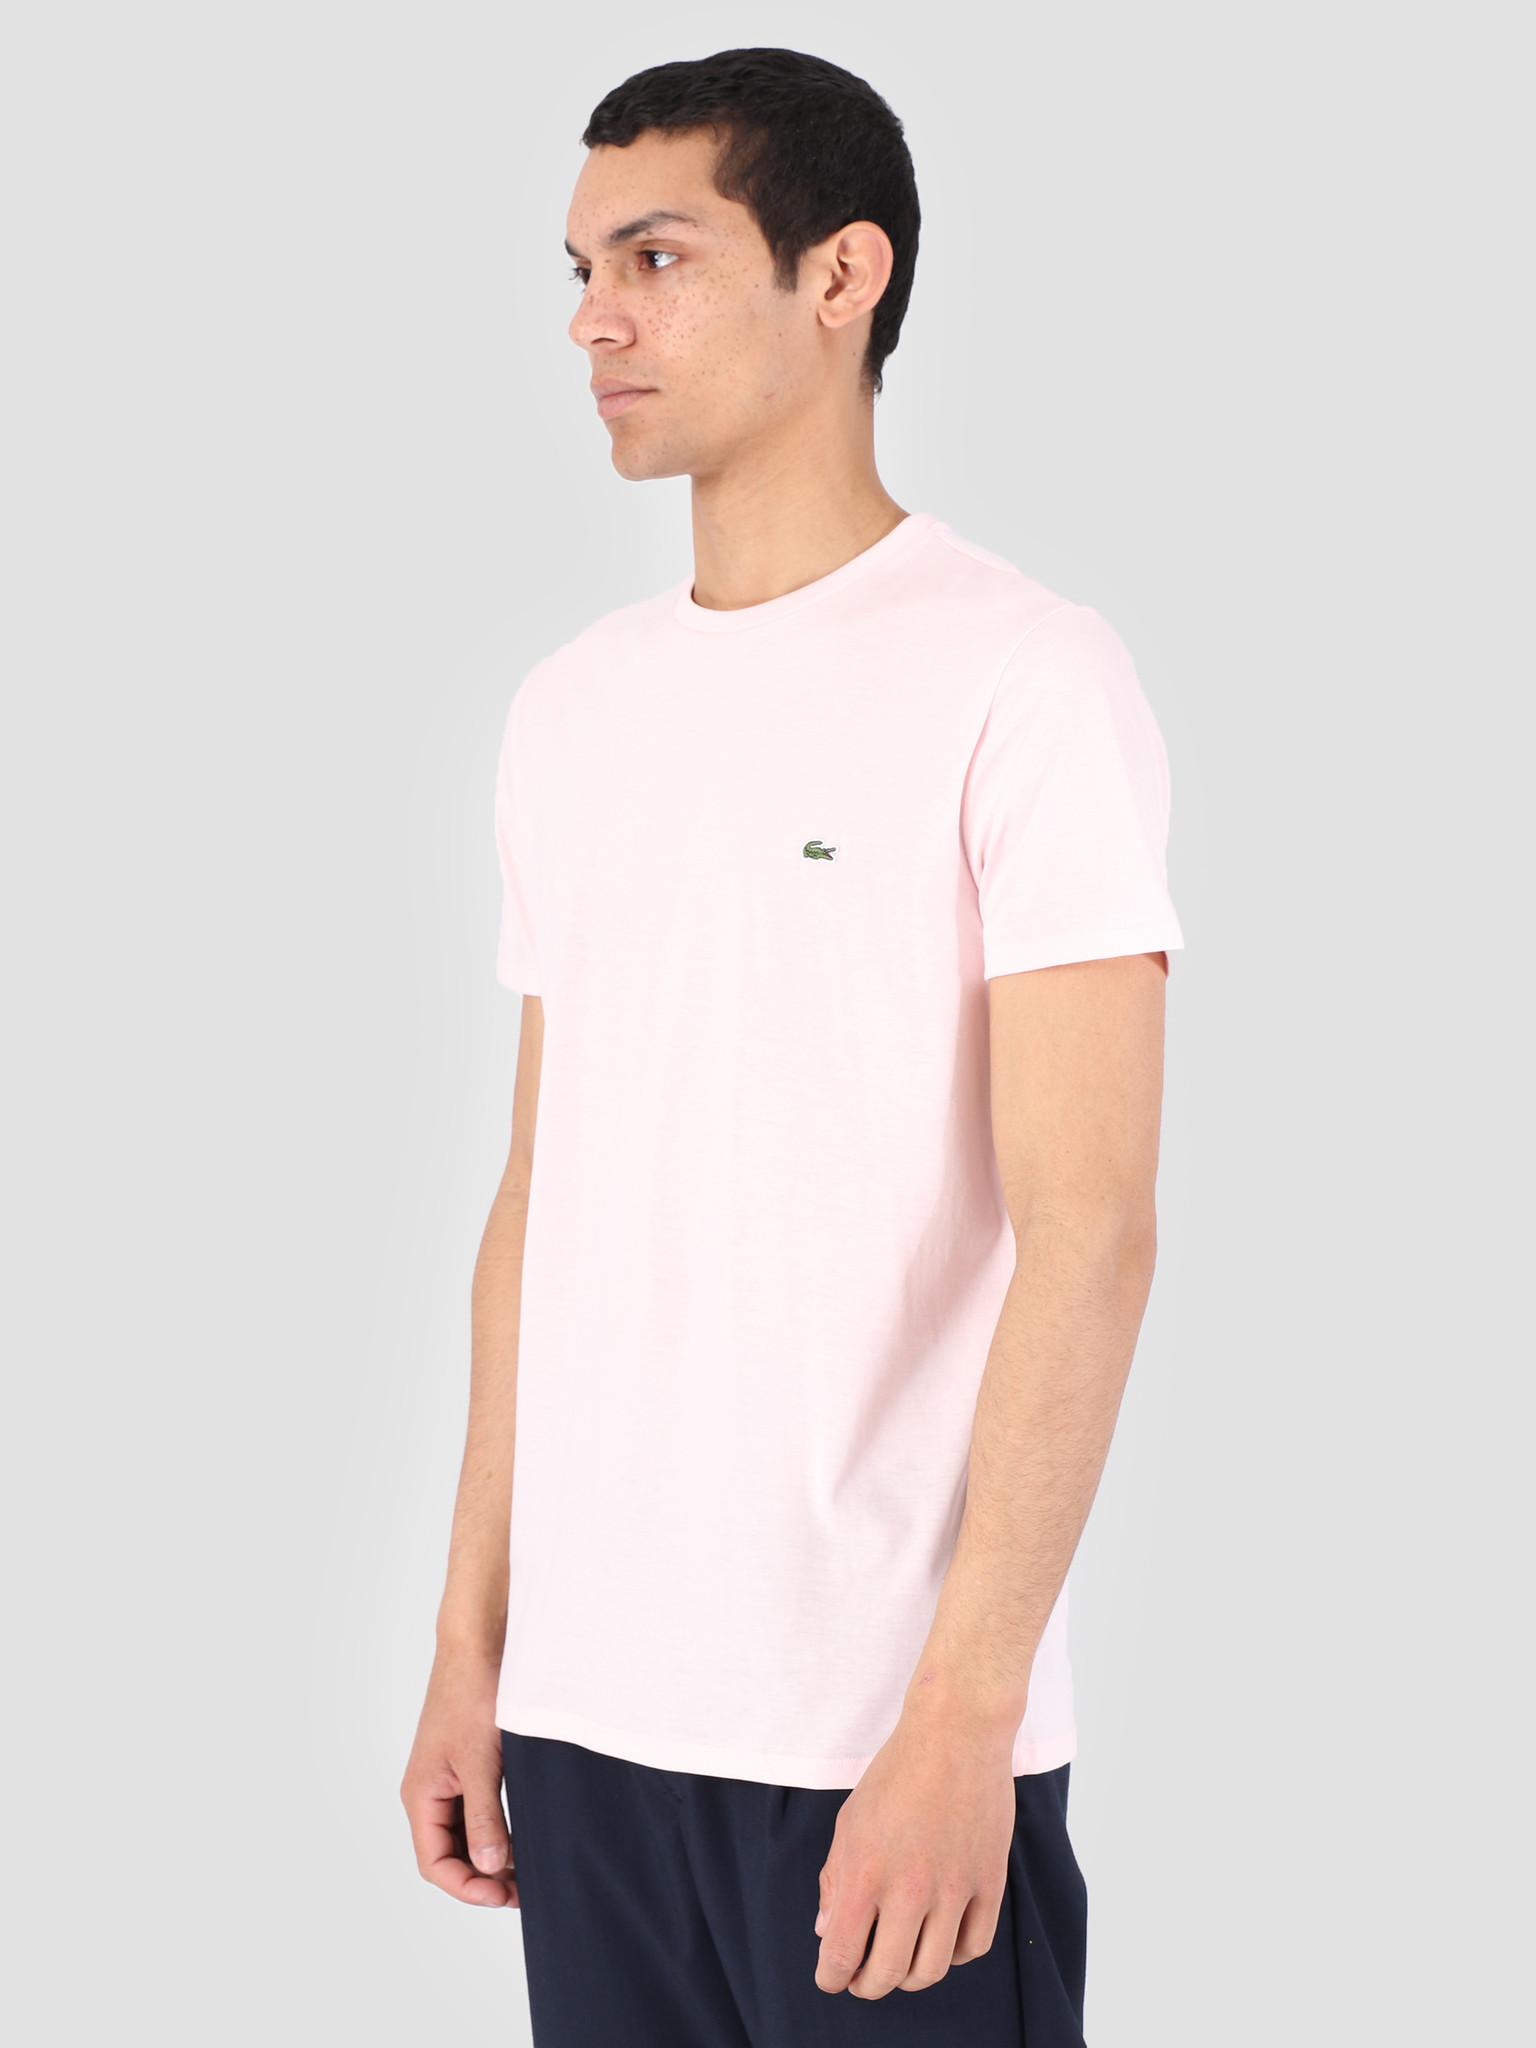 36379e1ba60 Lacoste 1Ht1 Men S T-Shirt 011 Flamingo Th6709-91 - FRESHCOTTON